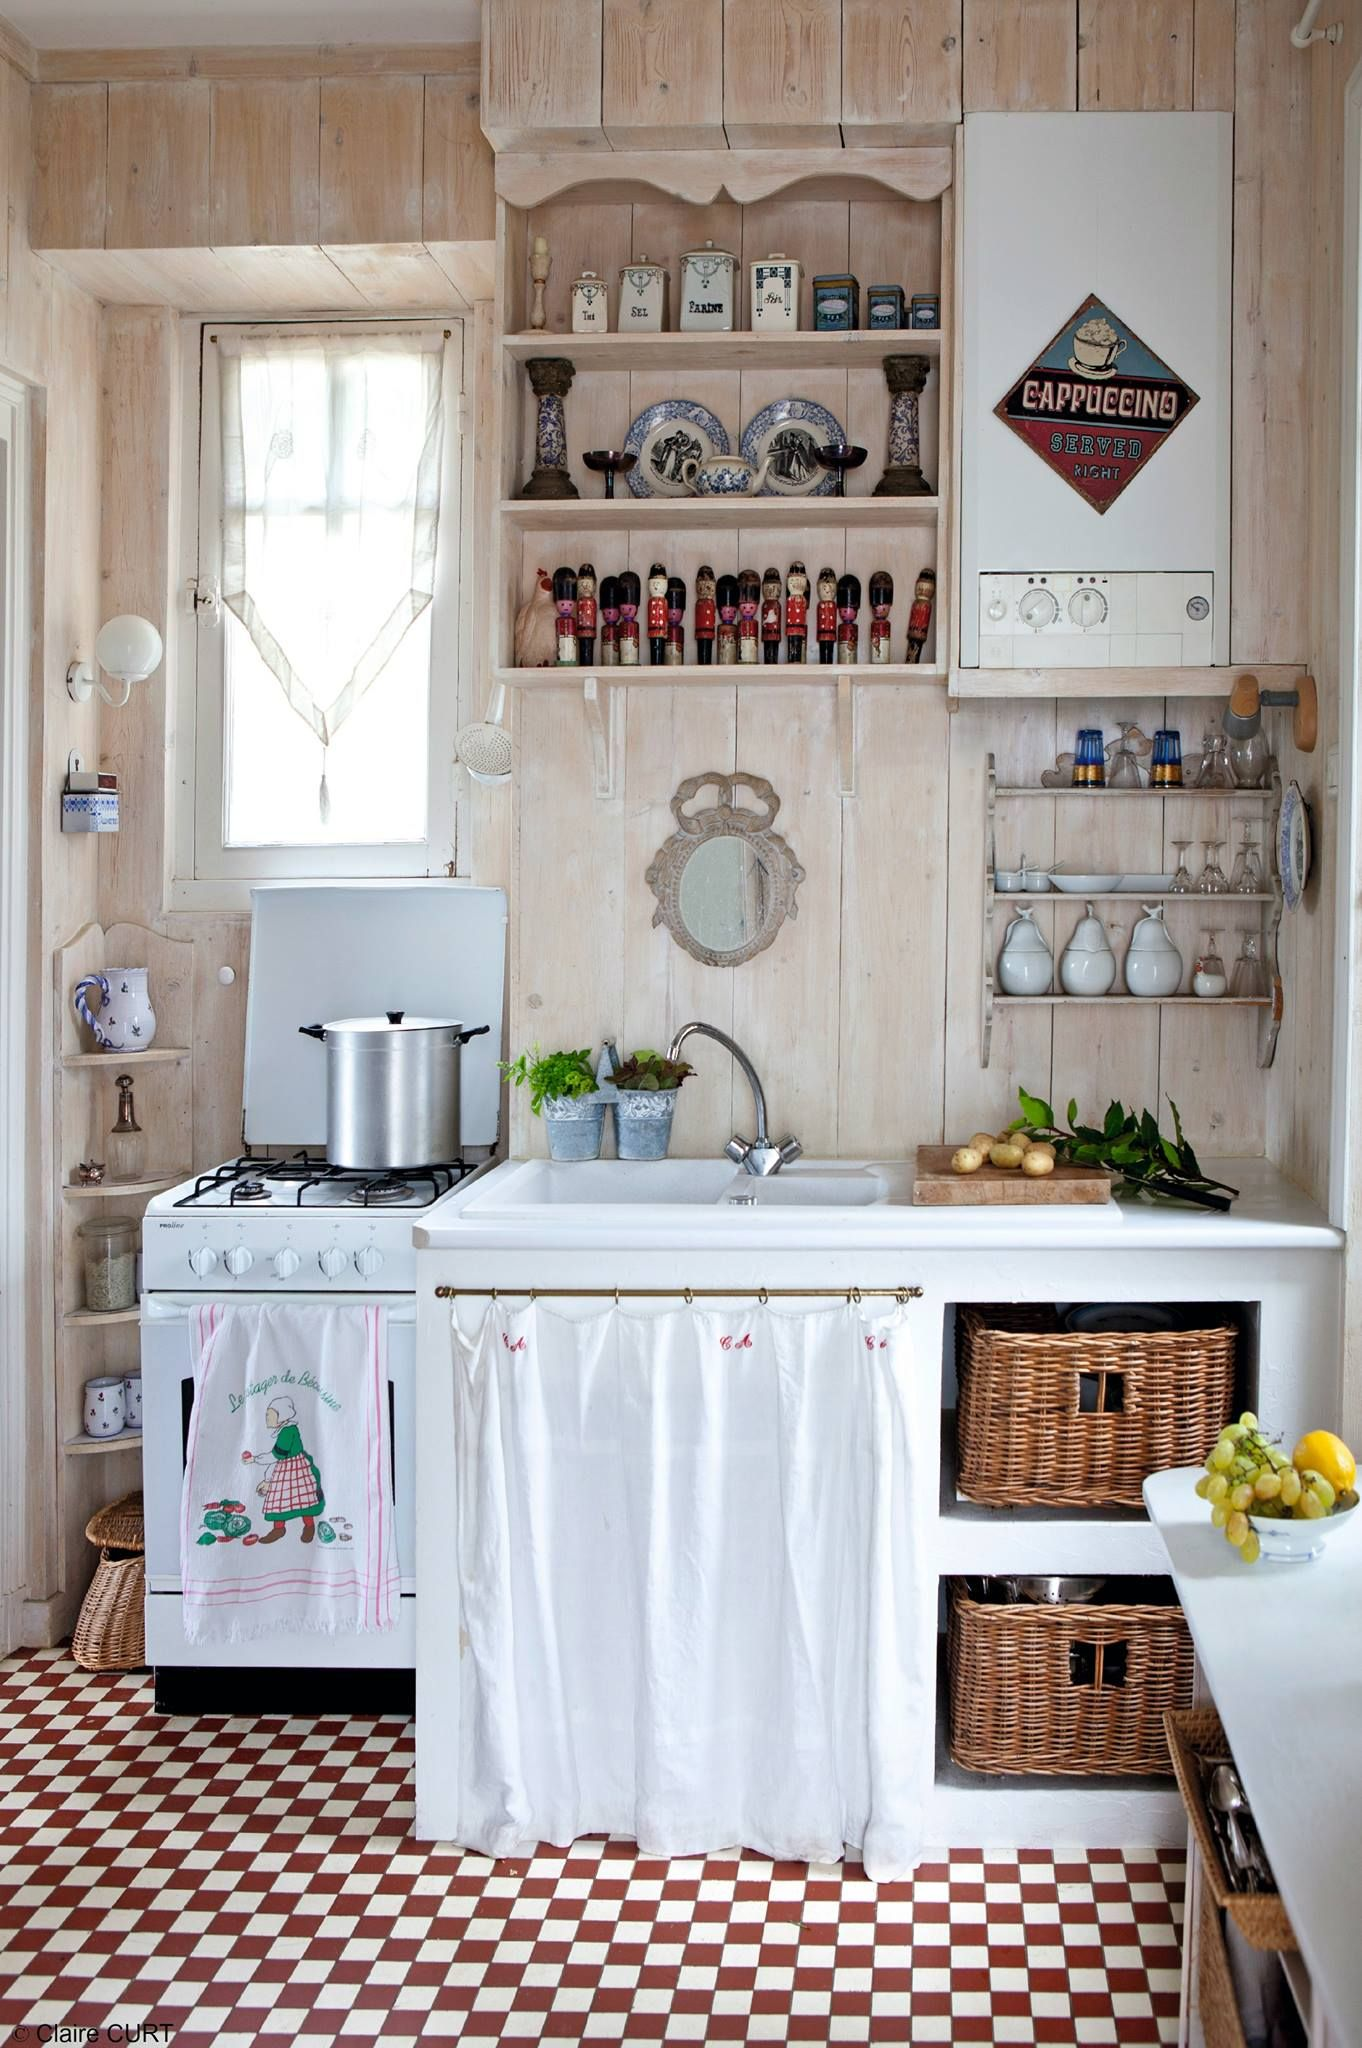 d coration campagnarde avec le sol carrel en rouge et blanc deco campagne cuisines id es. Black Bedroom Furniture Sets. Home Design Ideas